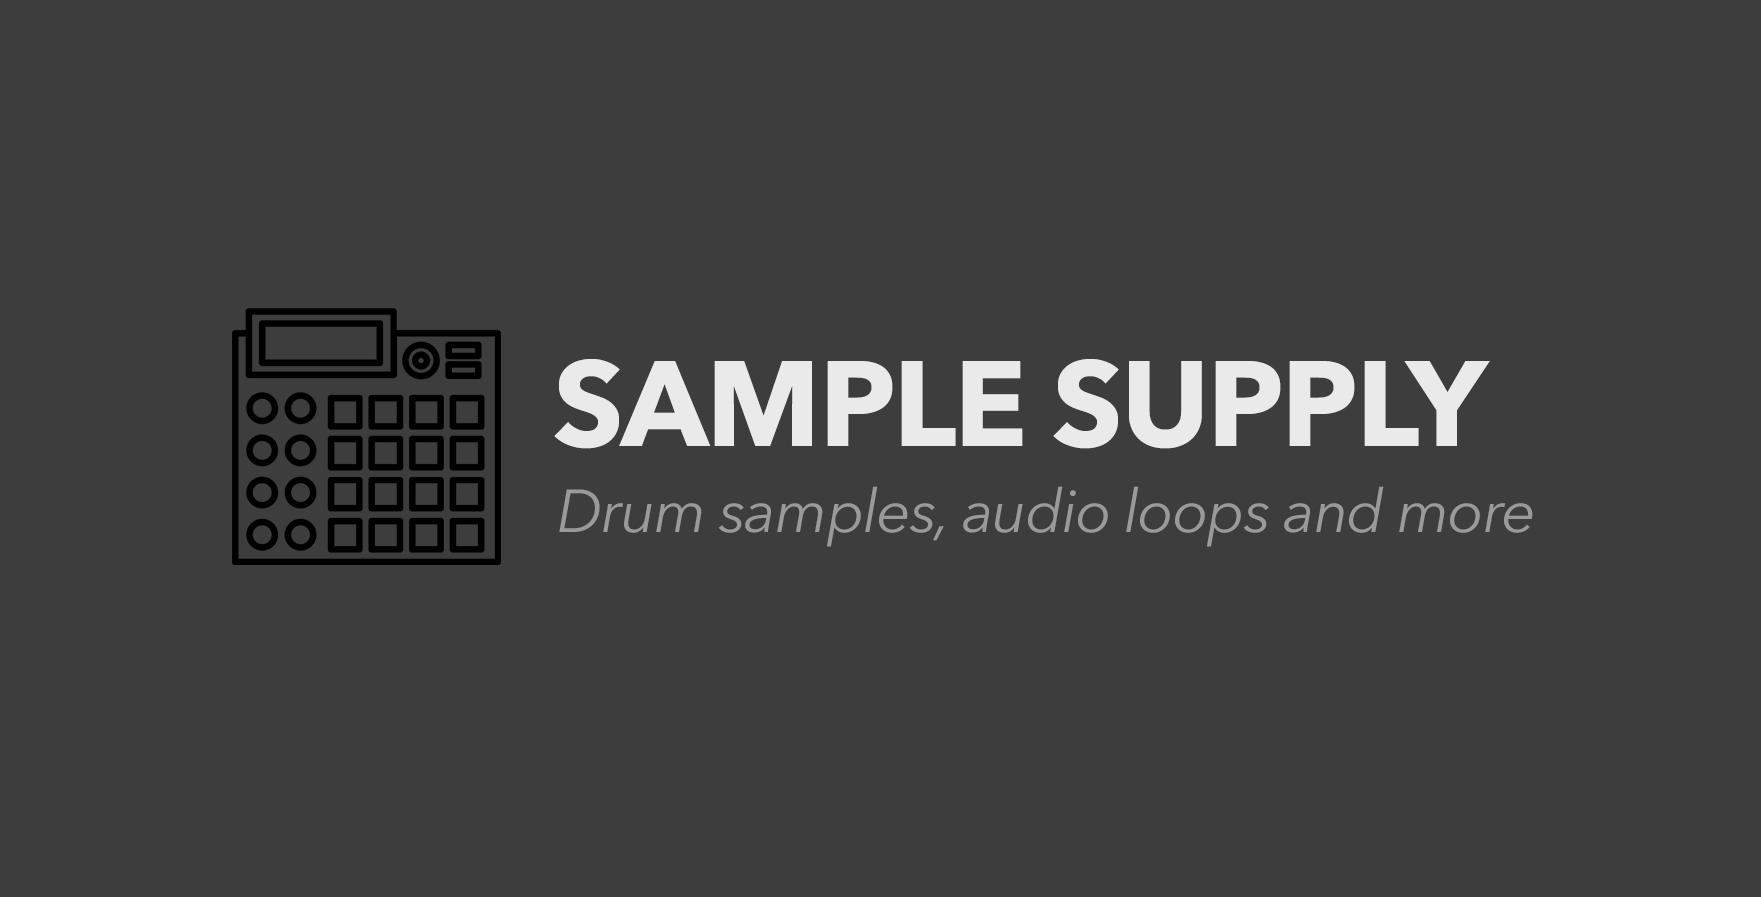 Sample Supply